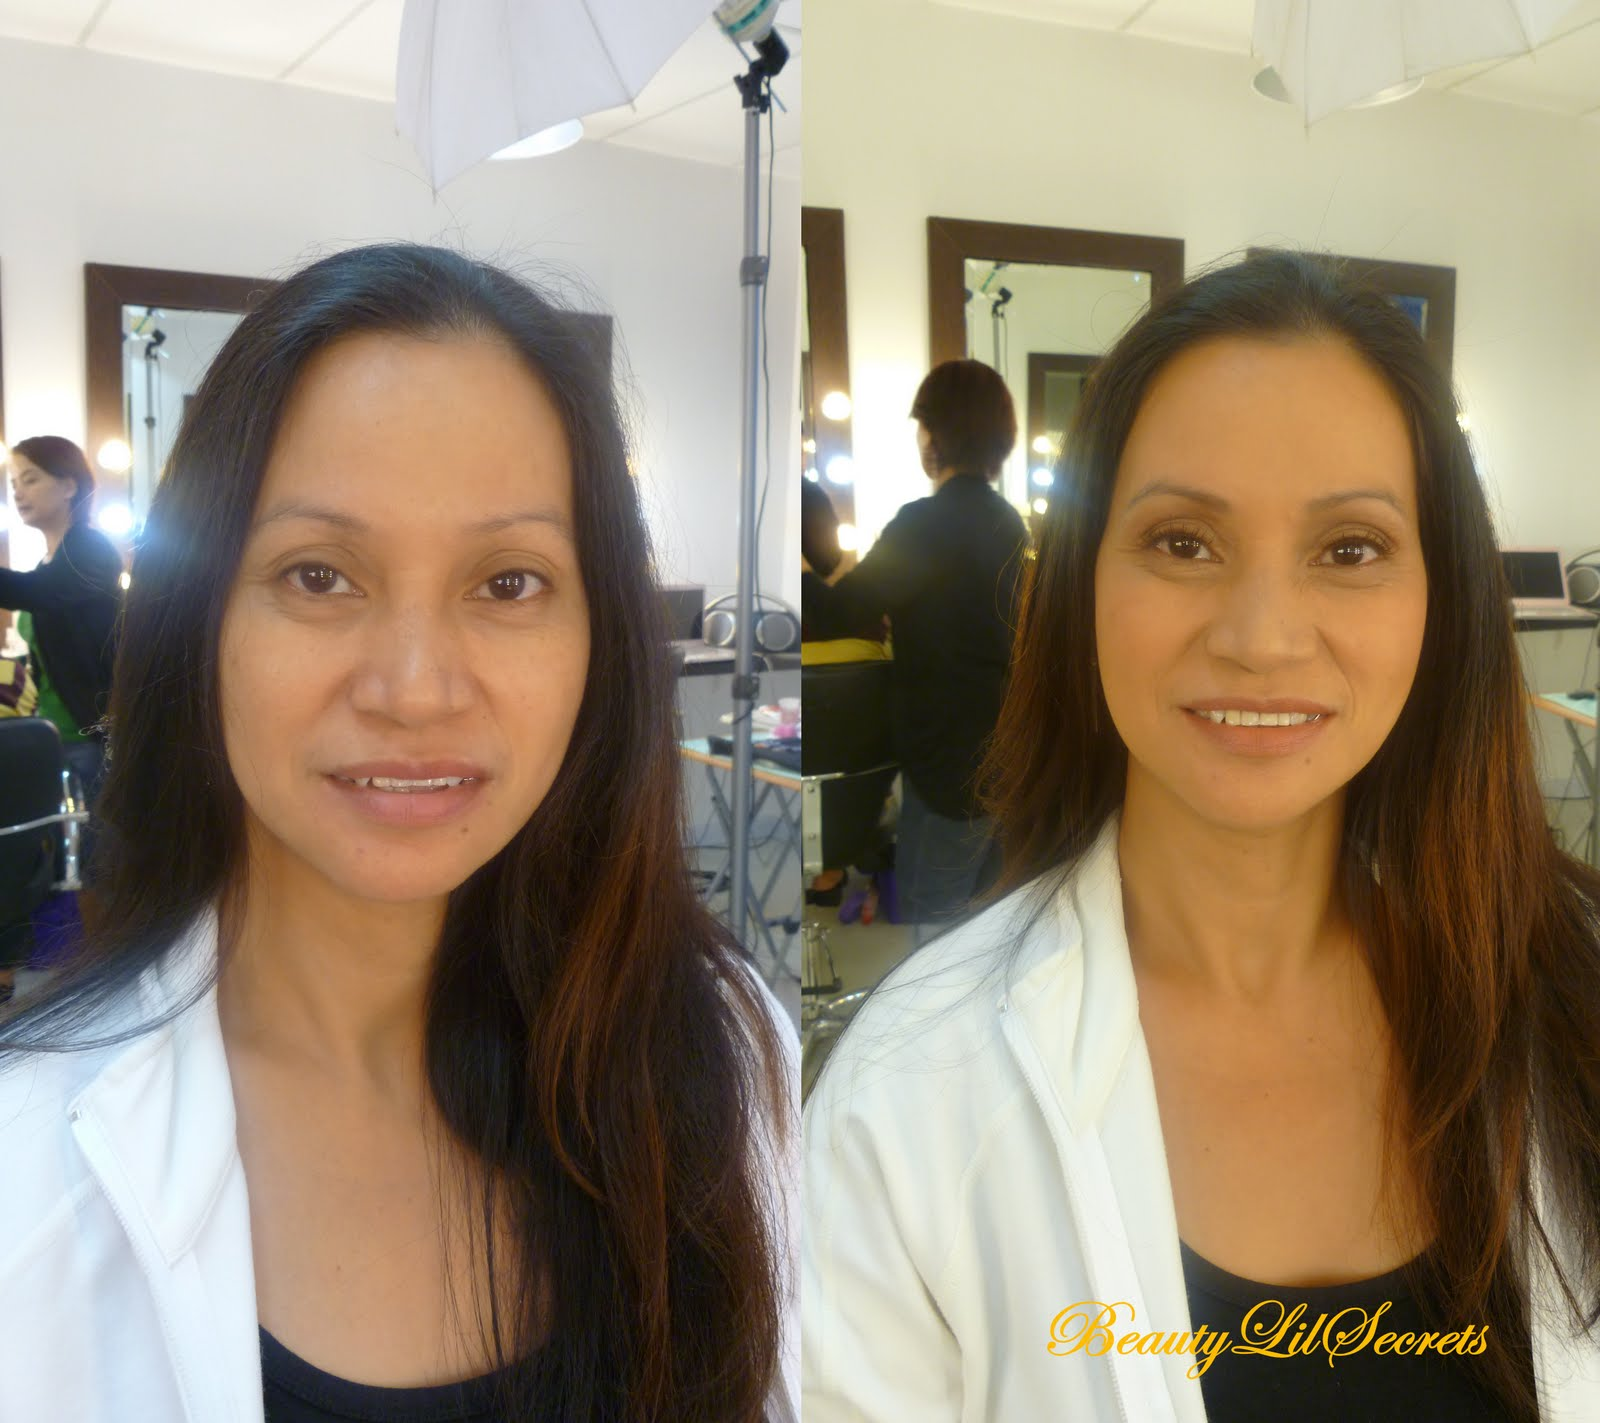 mature%2Bmakeup Mature Make Up / Make Up for Older Women